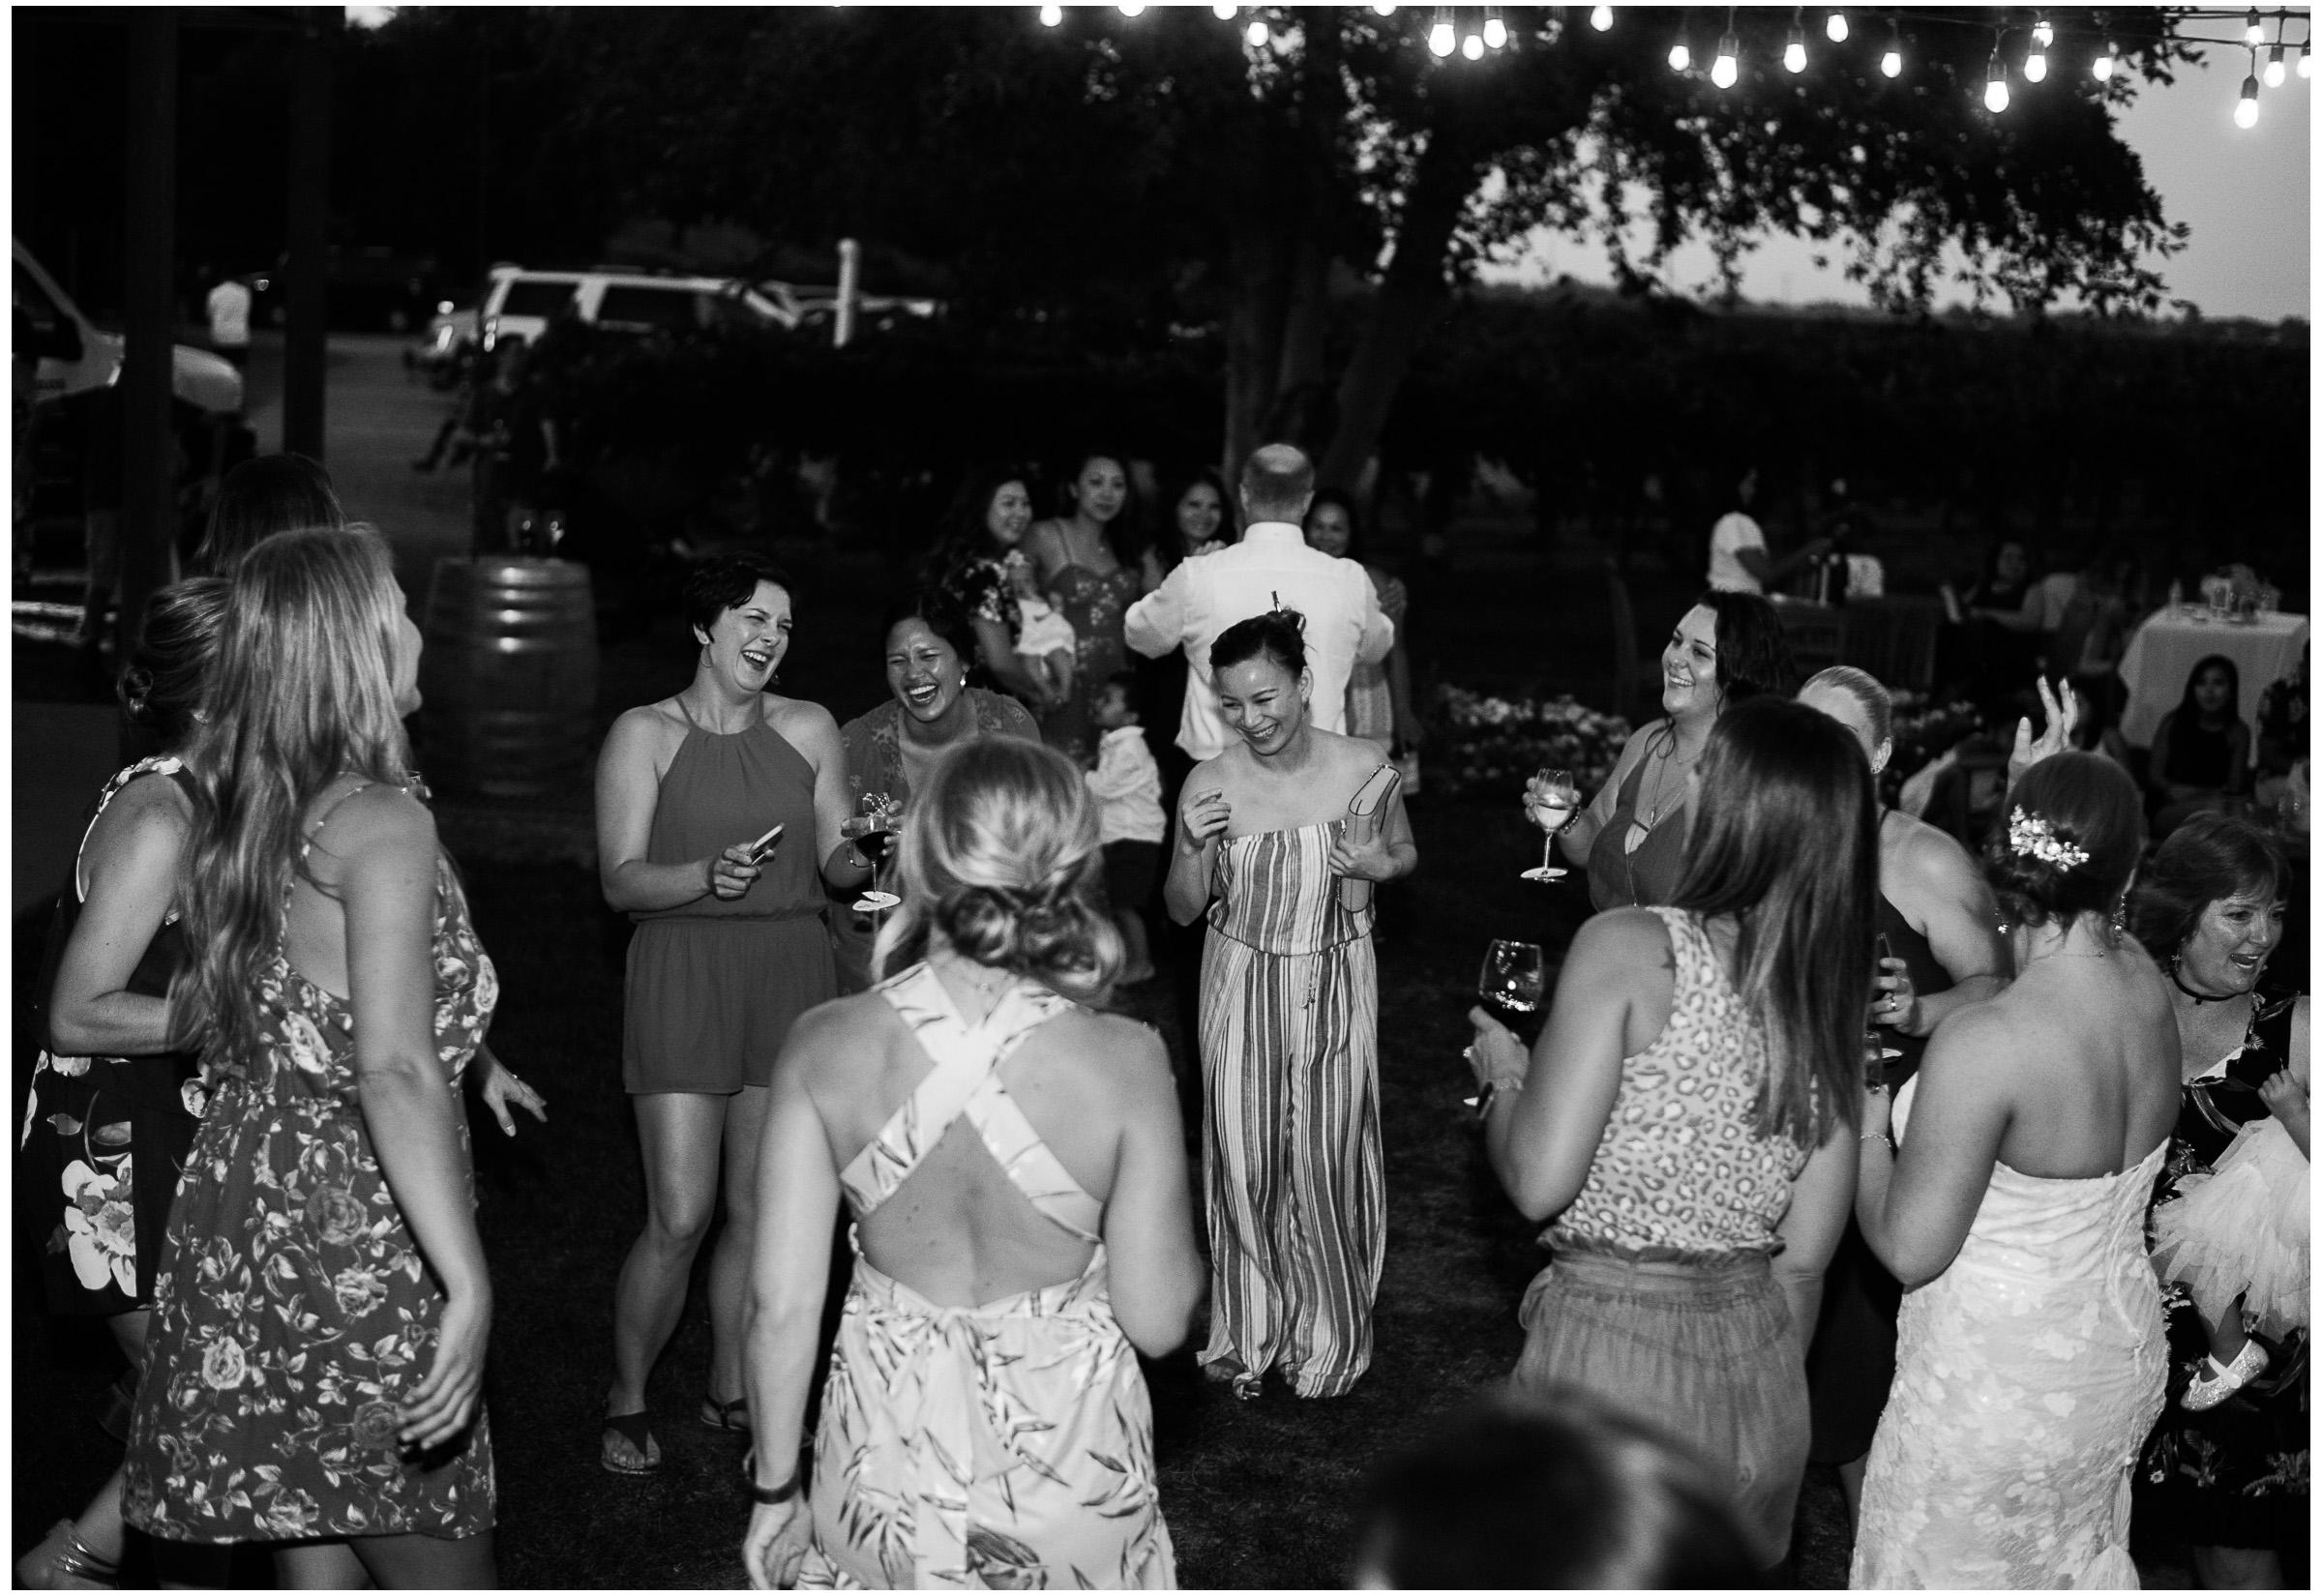 Clarksburg Wedding - Sacramento Photographer - Bogle Winery - Justin Wilcox Photography - 26.jpg